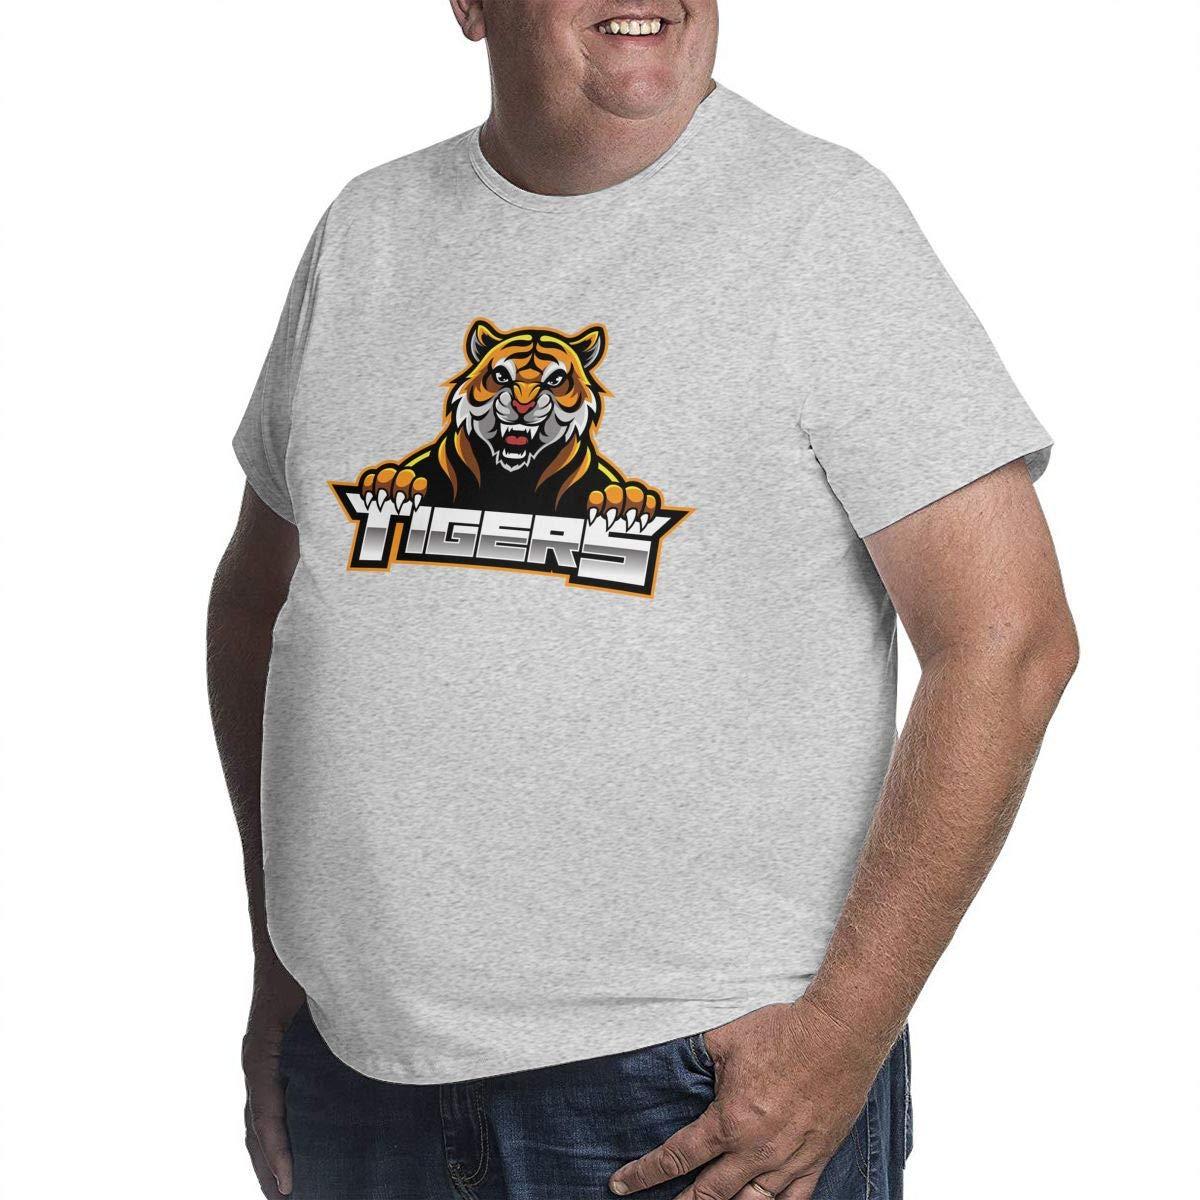 LONGTENG Designed T Shirt Catoon Tiger Big Size T-Shirt O-Neck 100/% Soft Cotton for Men Black